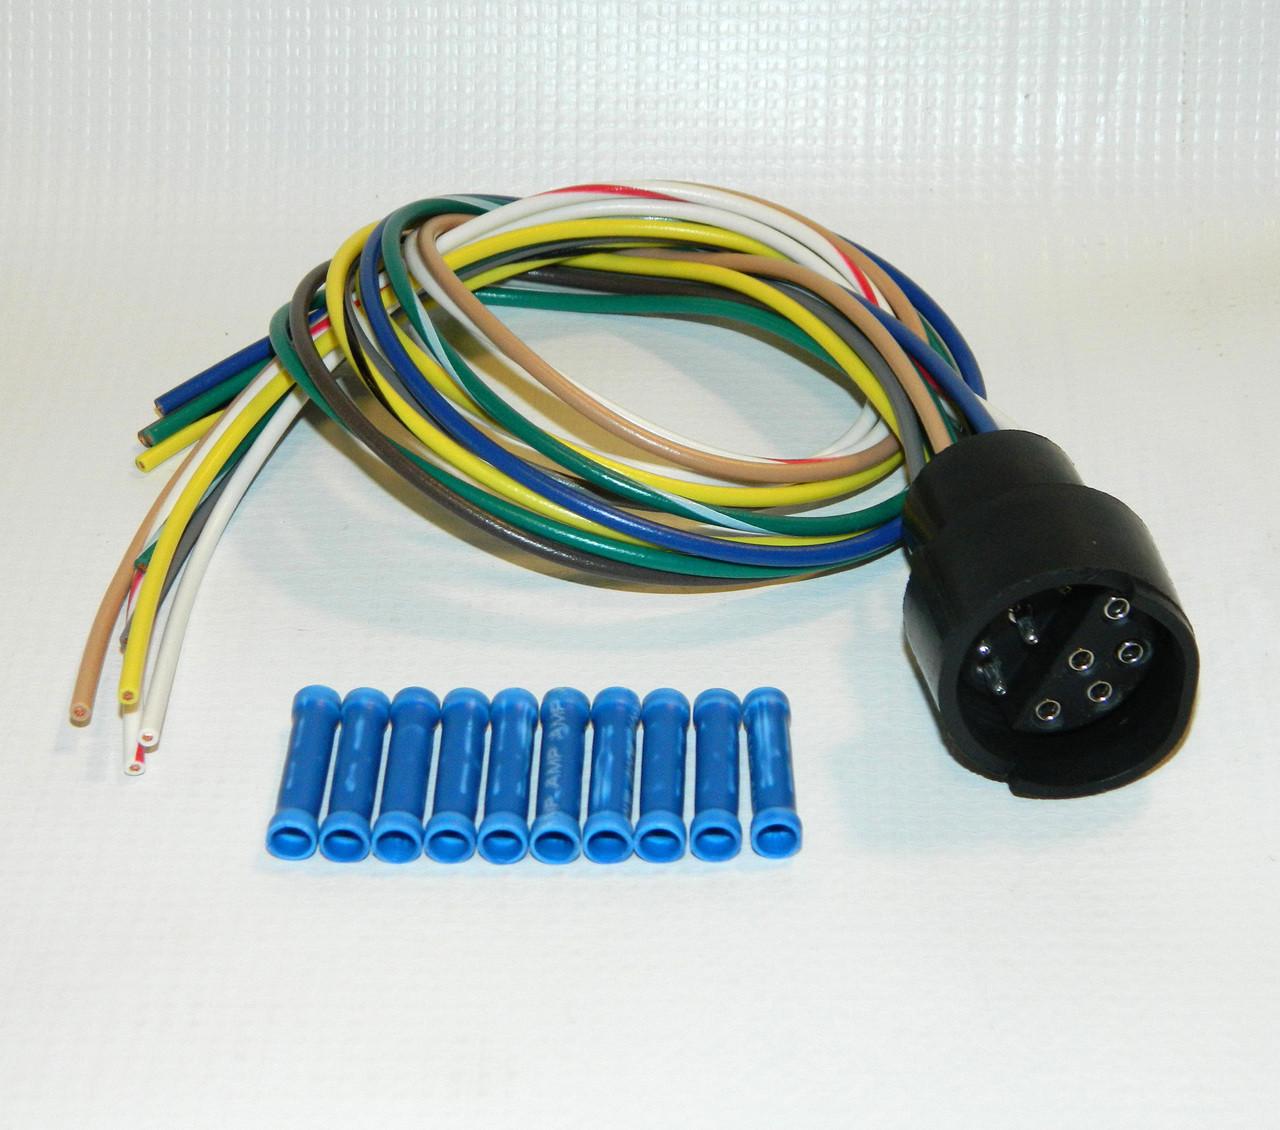 medium resolution of hn38813075 hiniker plow side 10 pin pigtail repair kit croft trailer supply